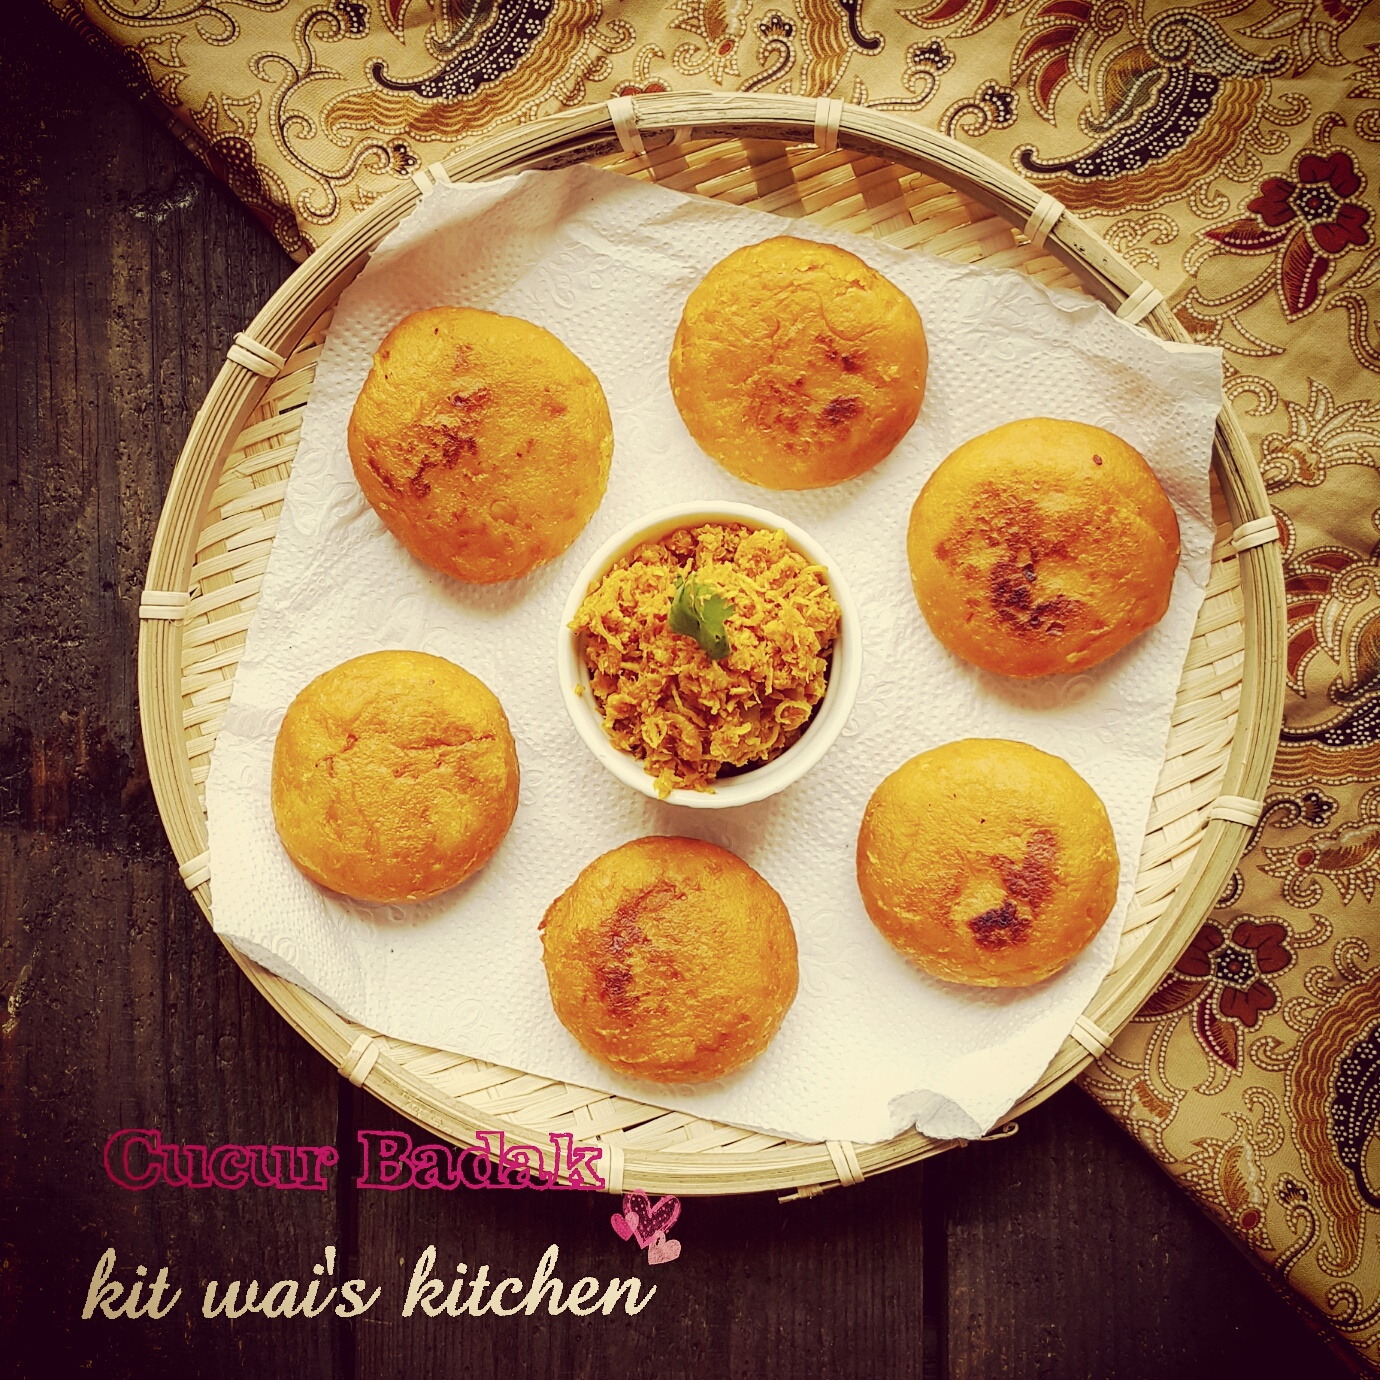 Kit Wai's Kitchen : 三巴虾米番薯煎糕